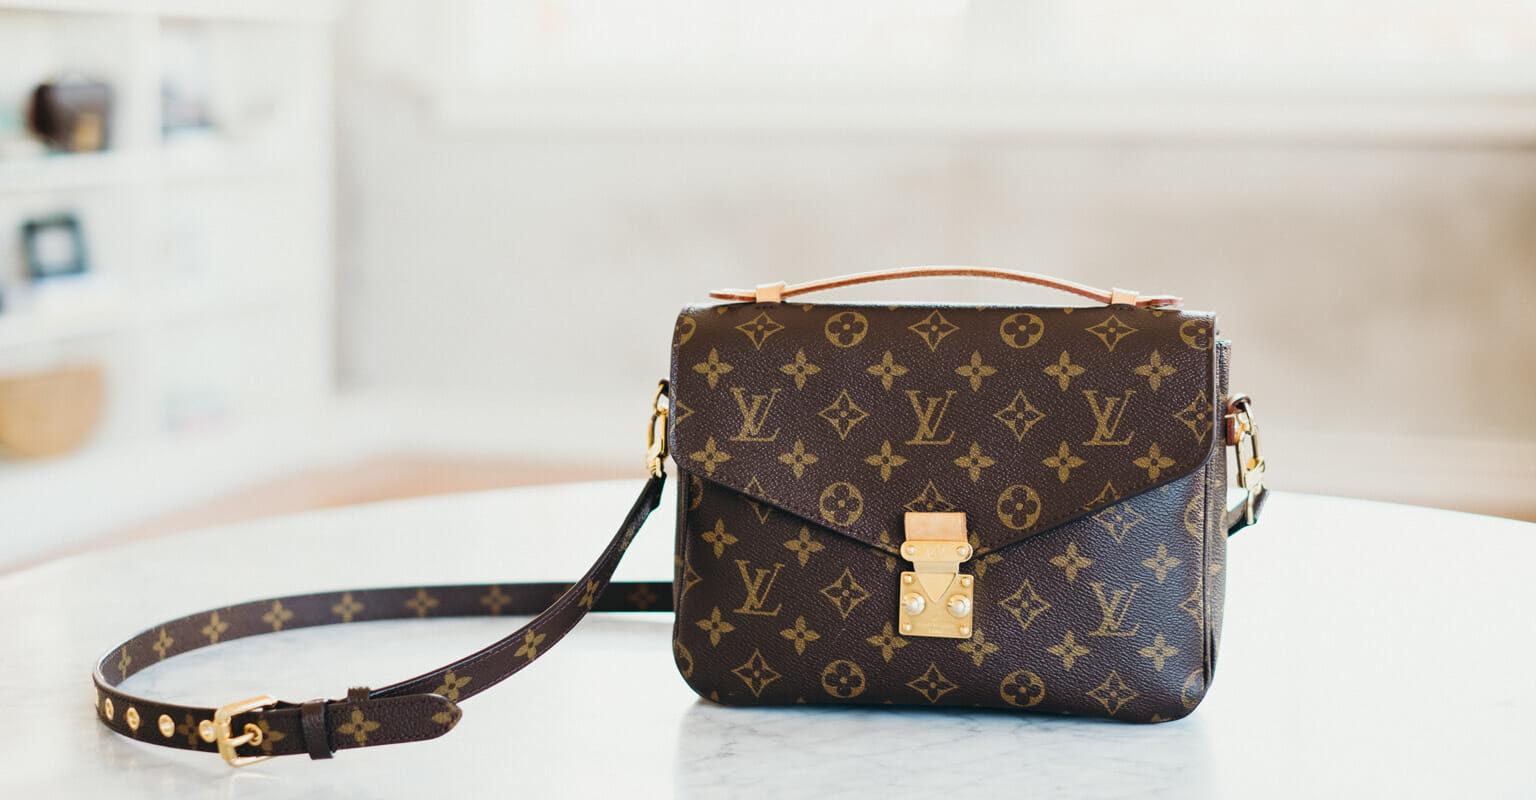 b83226faf What's In My Purse: Louis Vuitton Pochette Metis